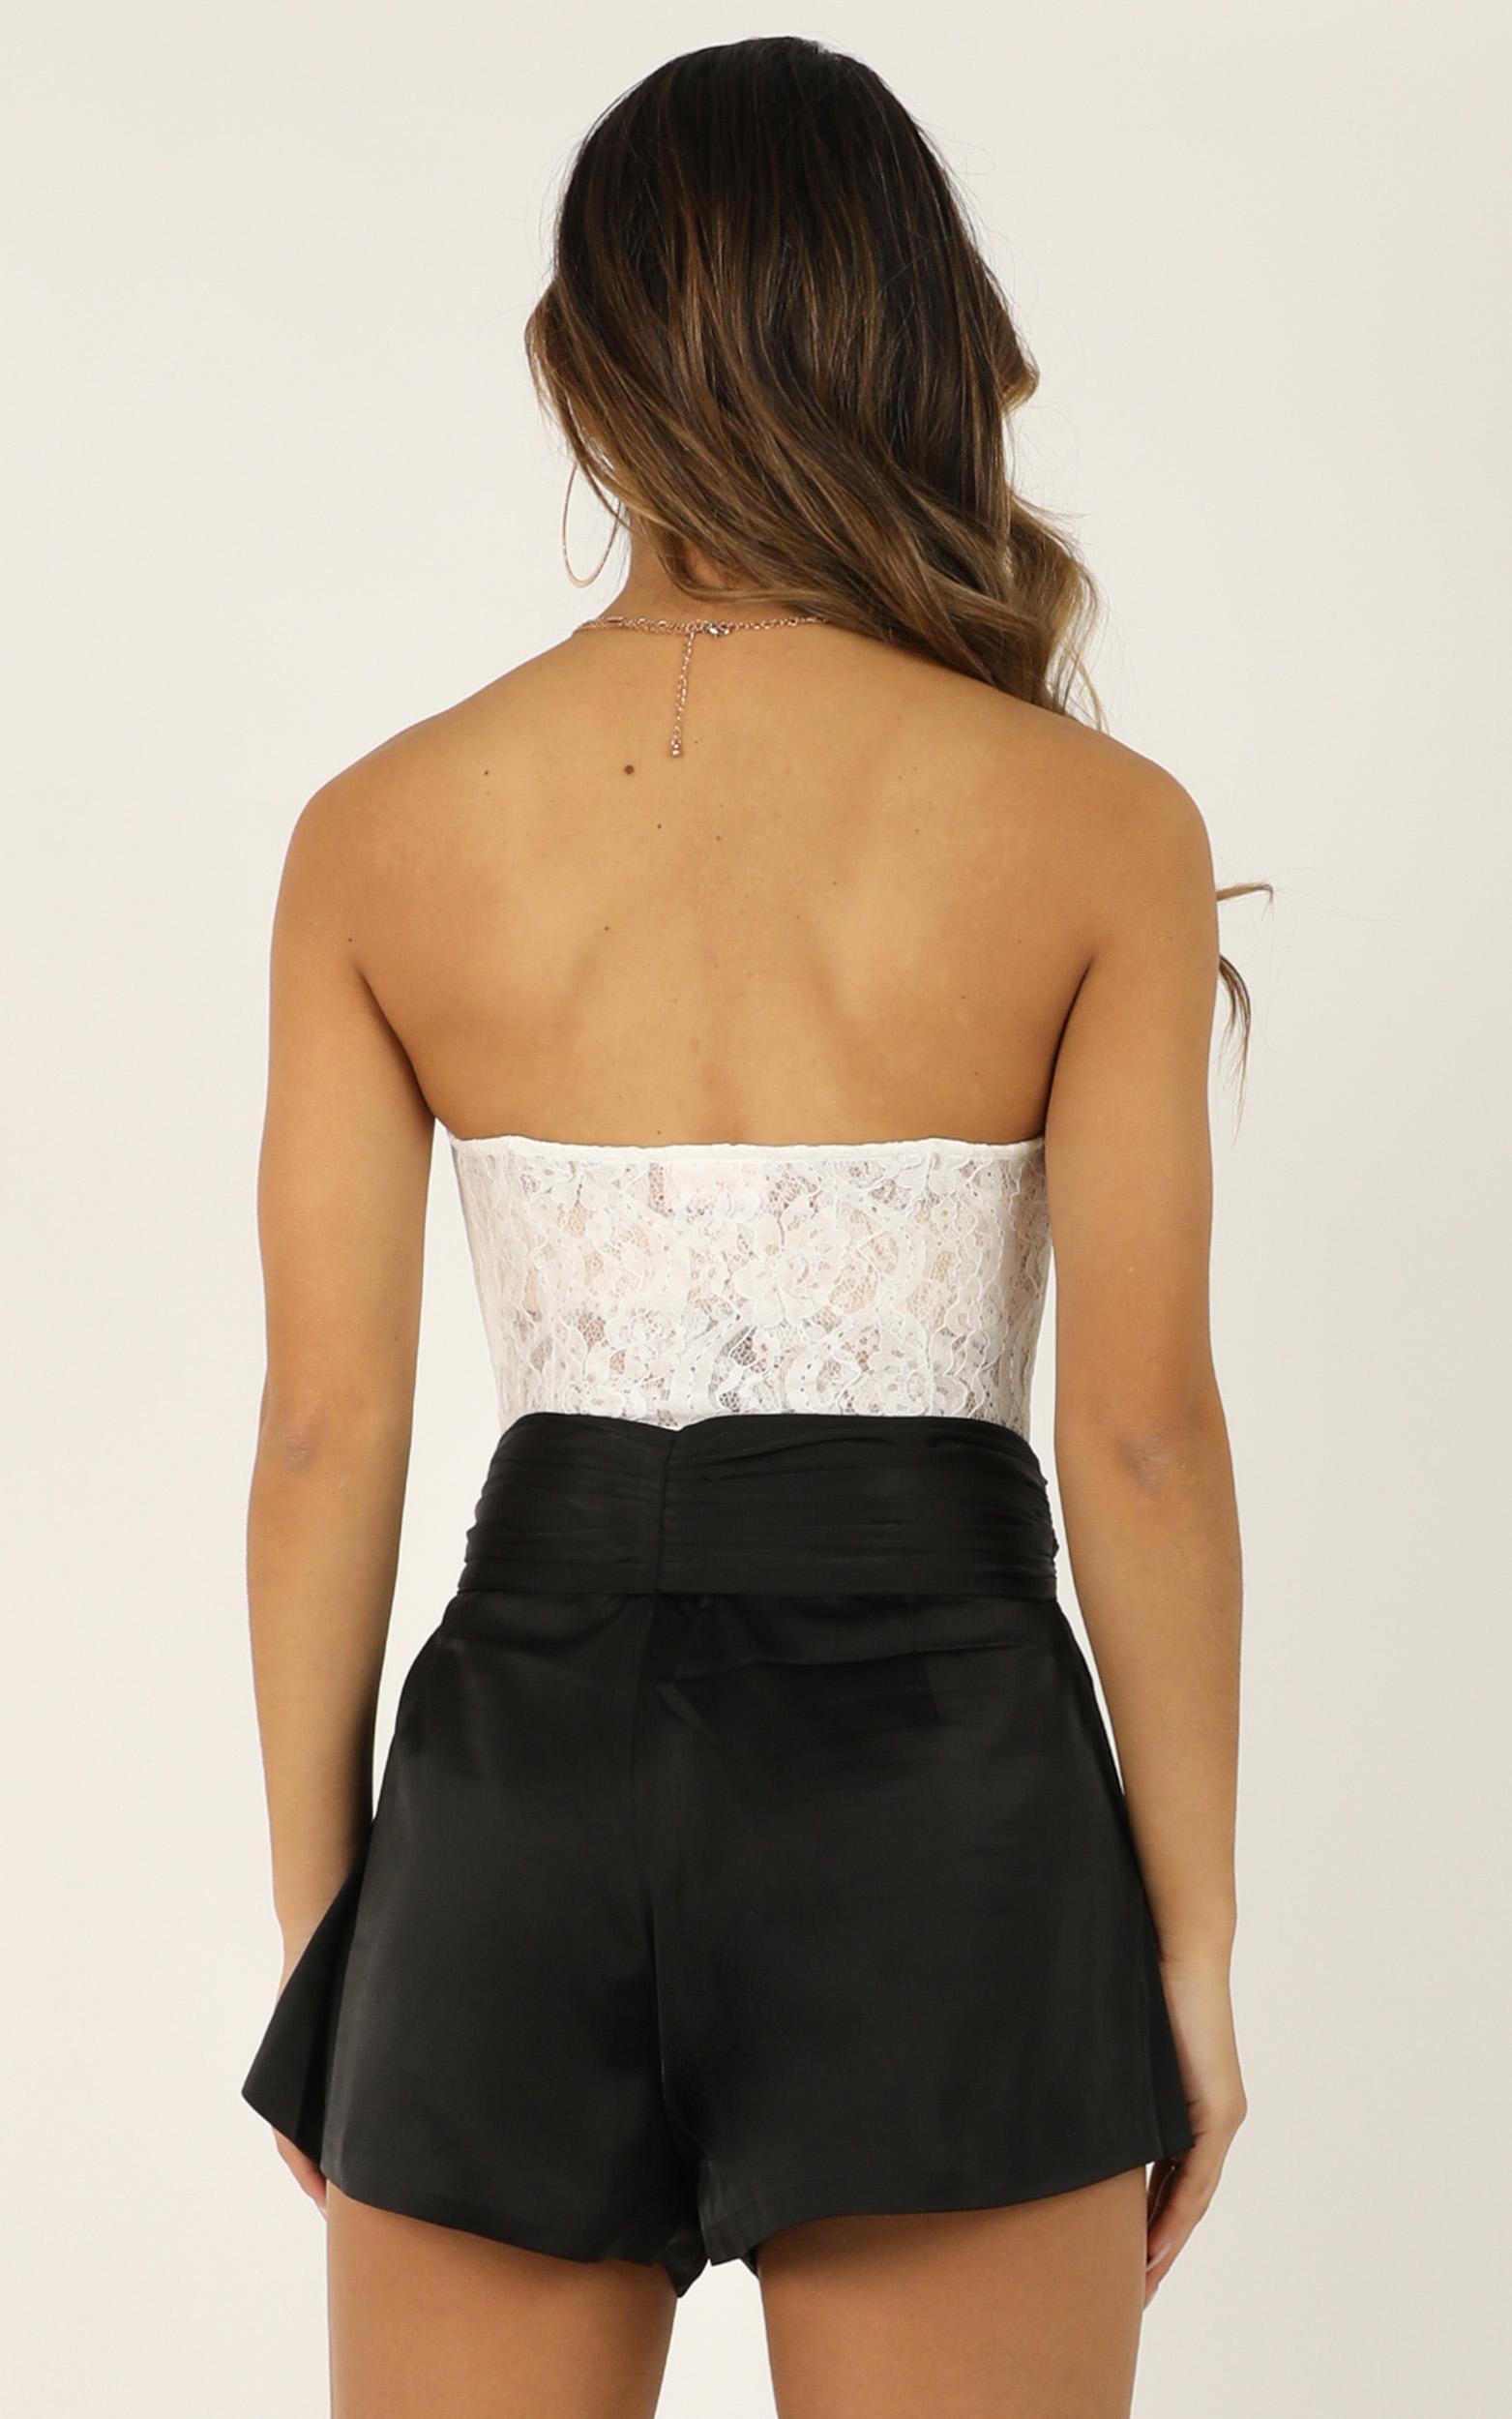 Staring Me Down Shorts In black satin - 14 (XL), Black, hi-res image number null